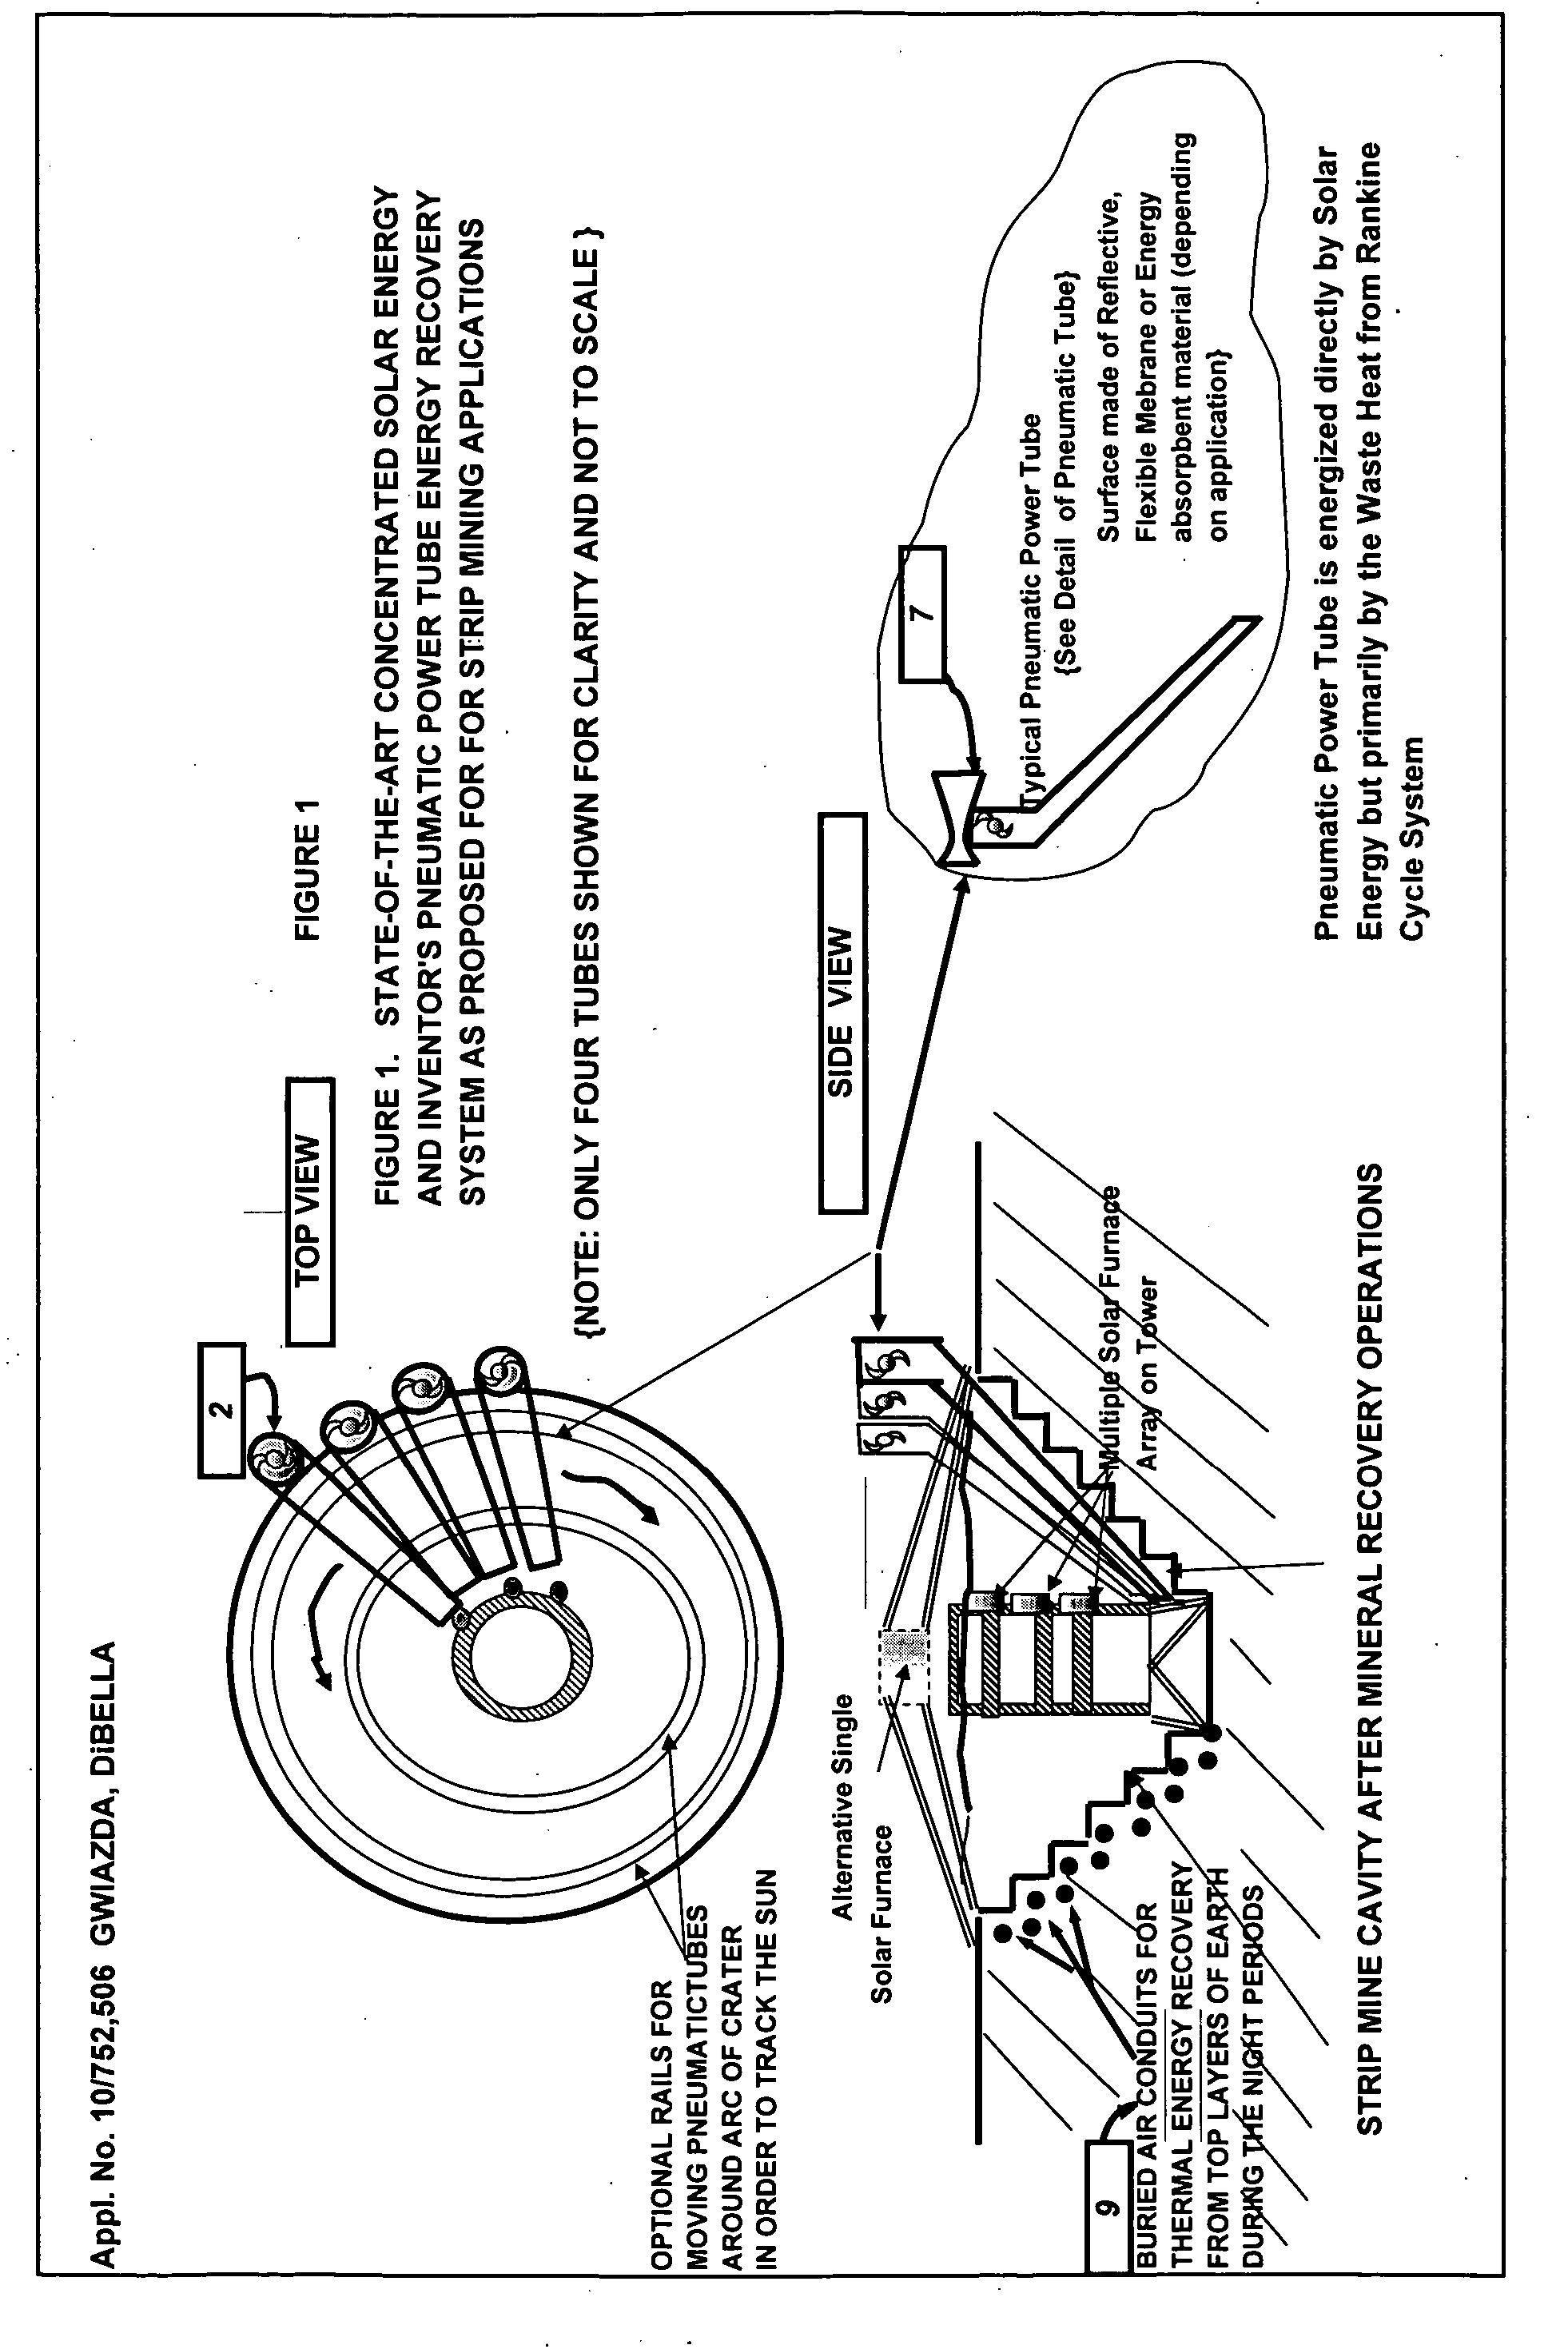 patent us20050150225  pneumatic